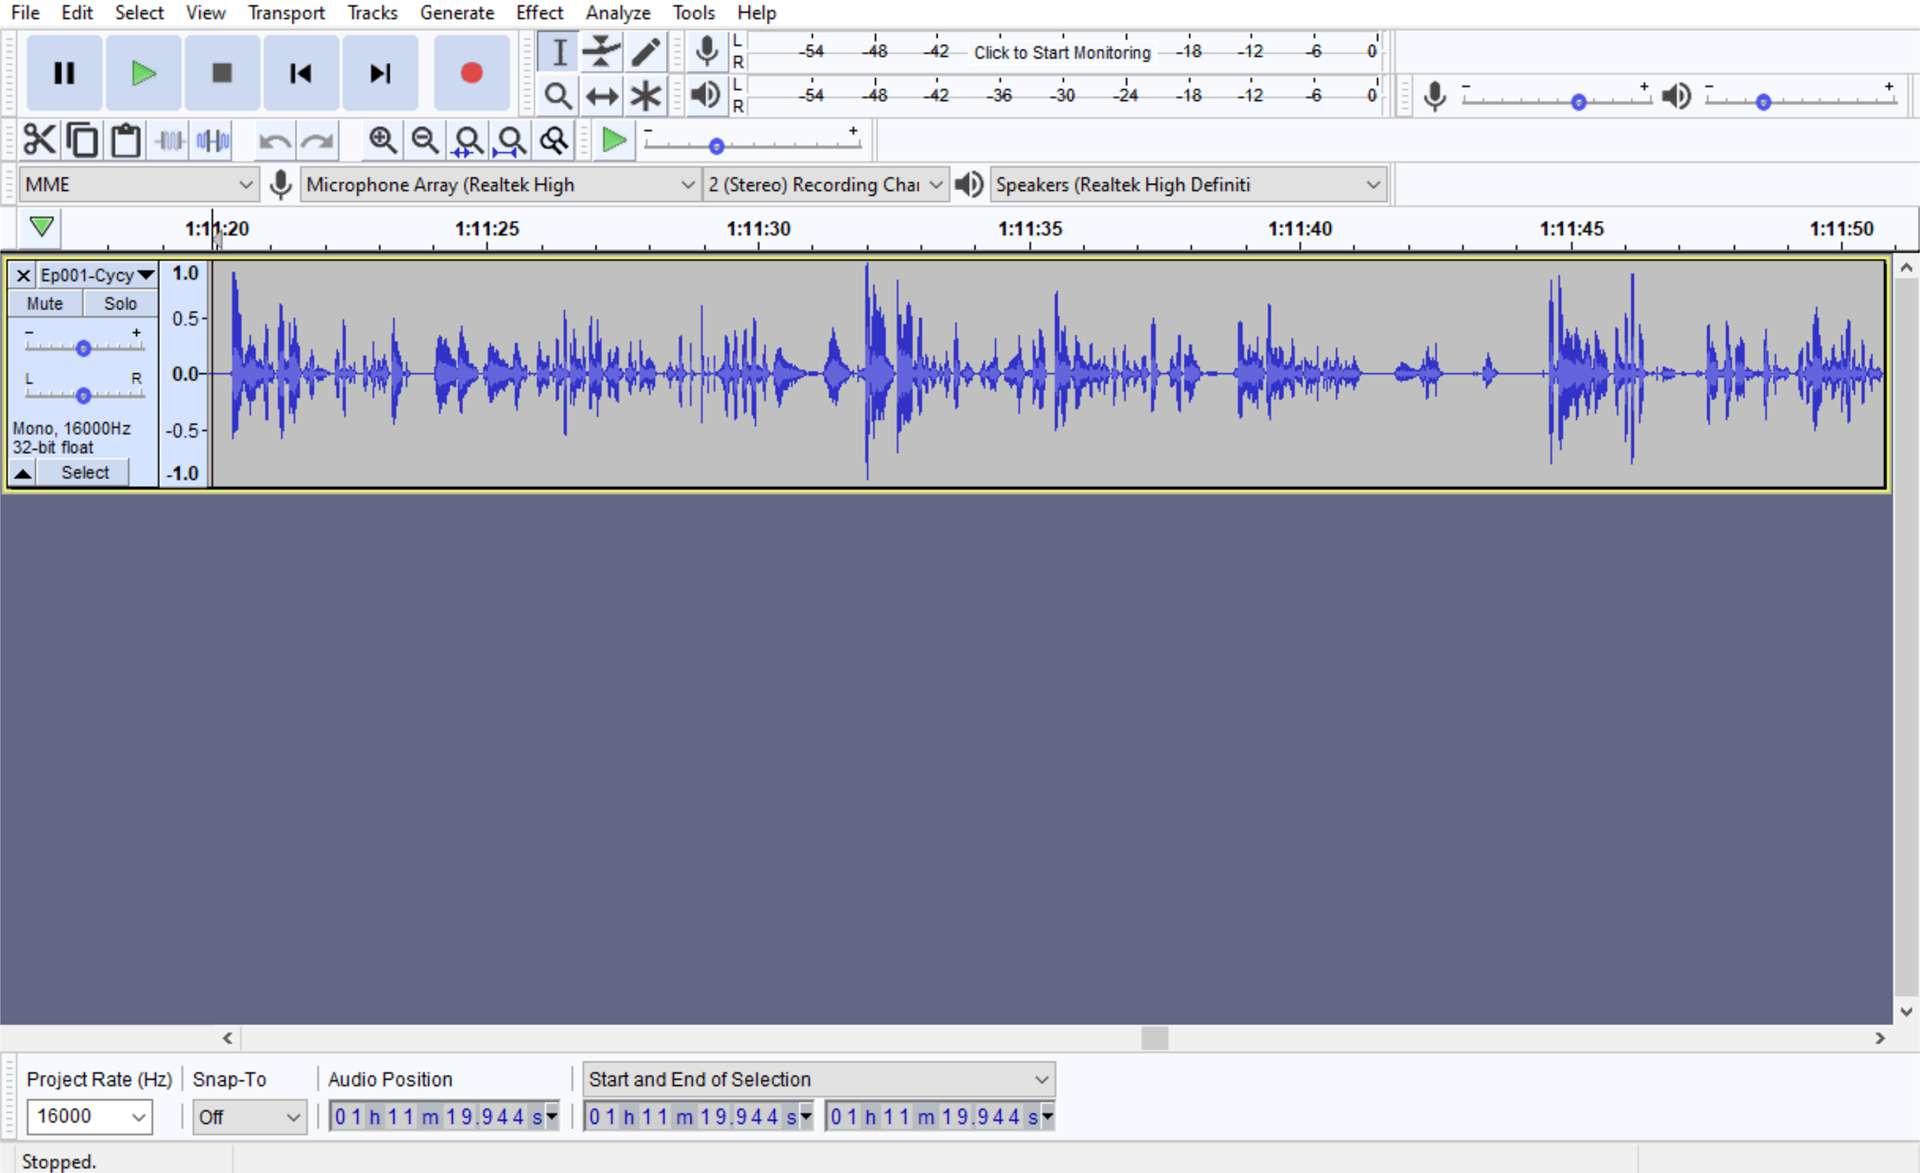 Windows 10 Audacity audio editing app.